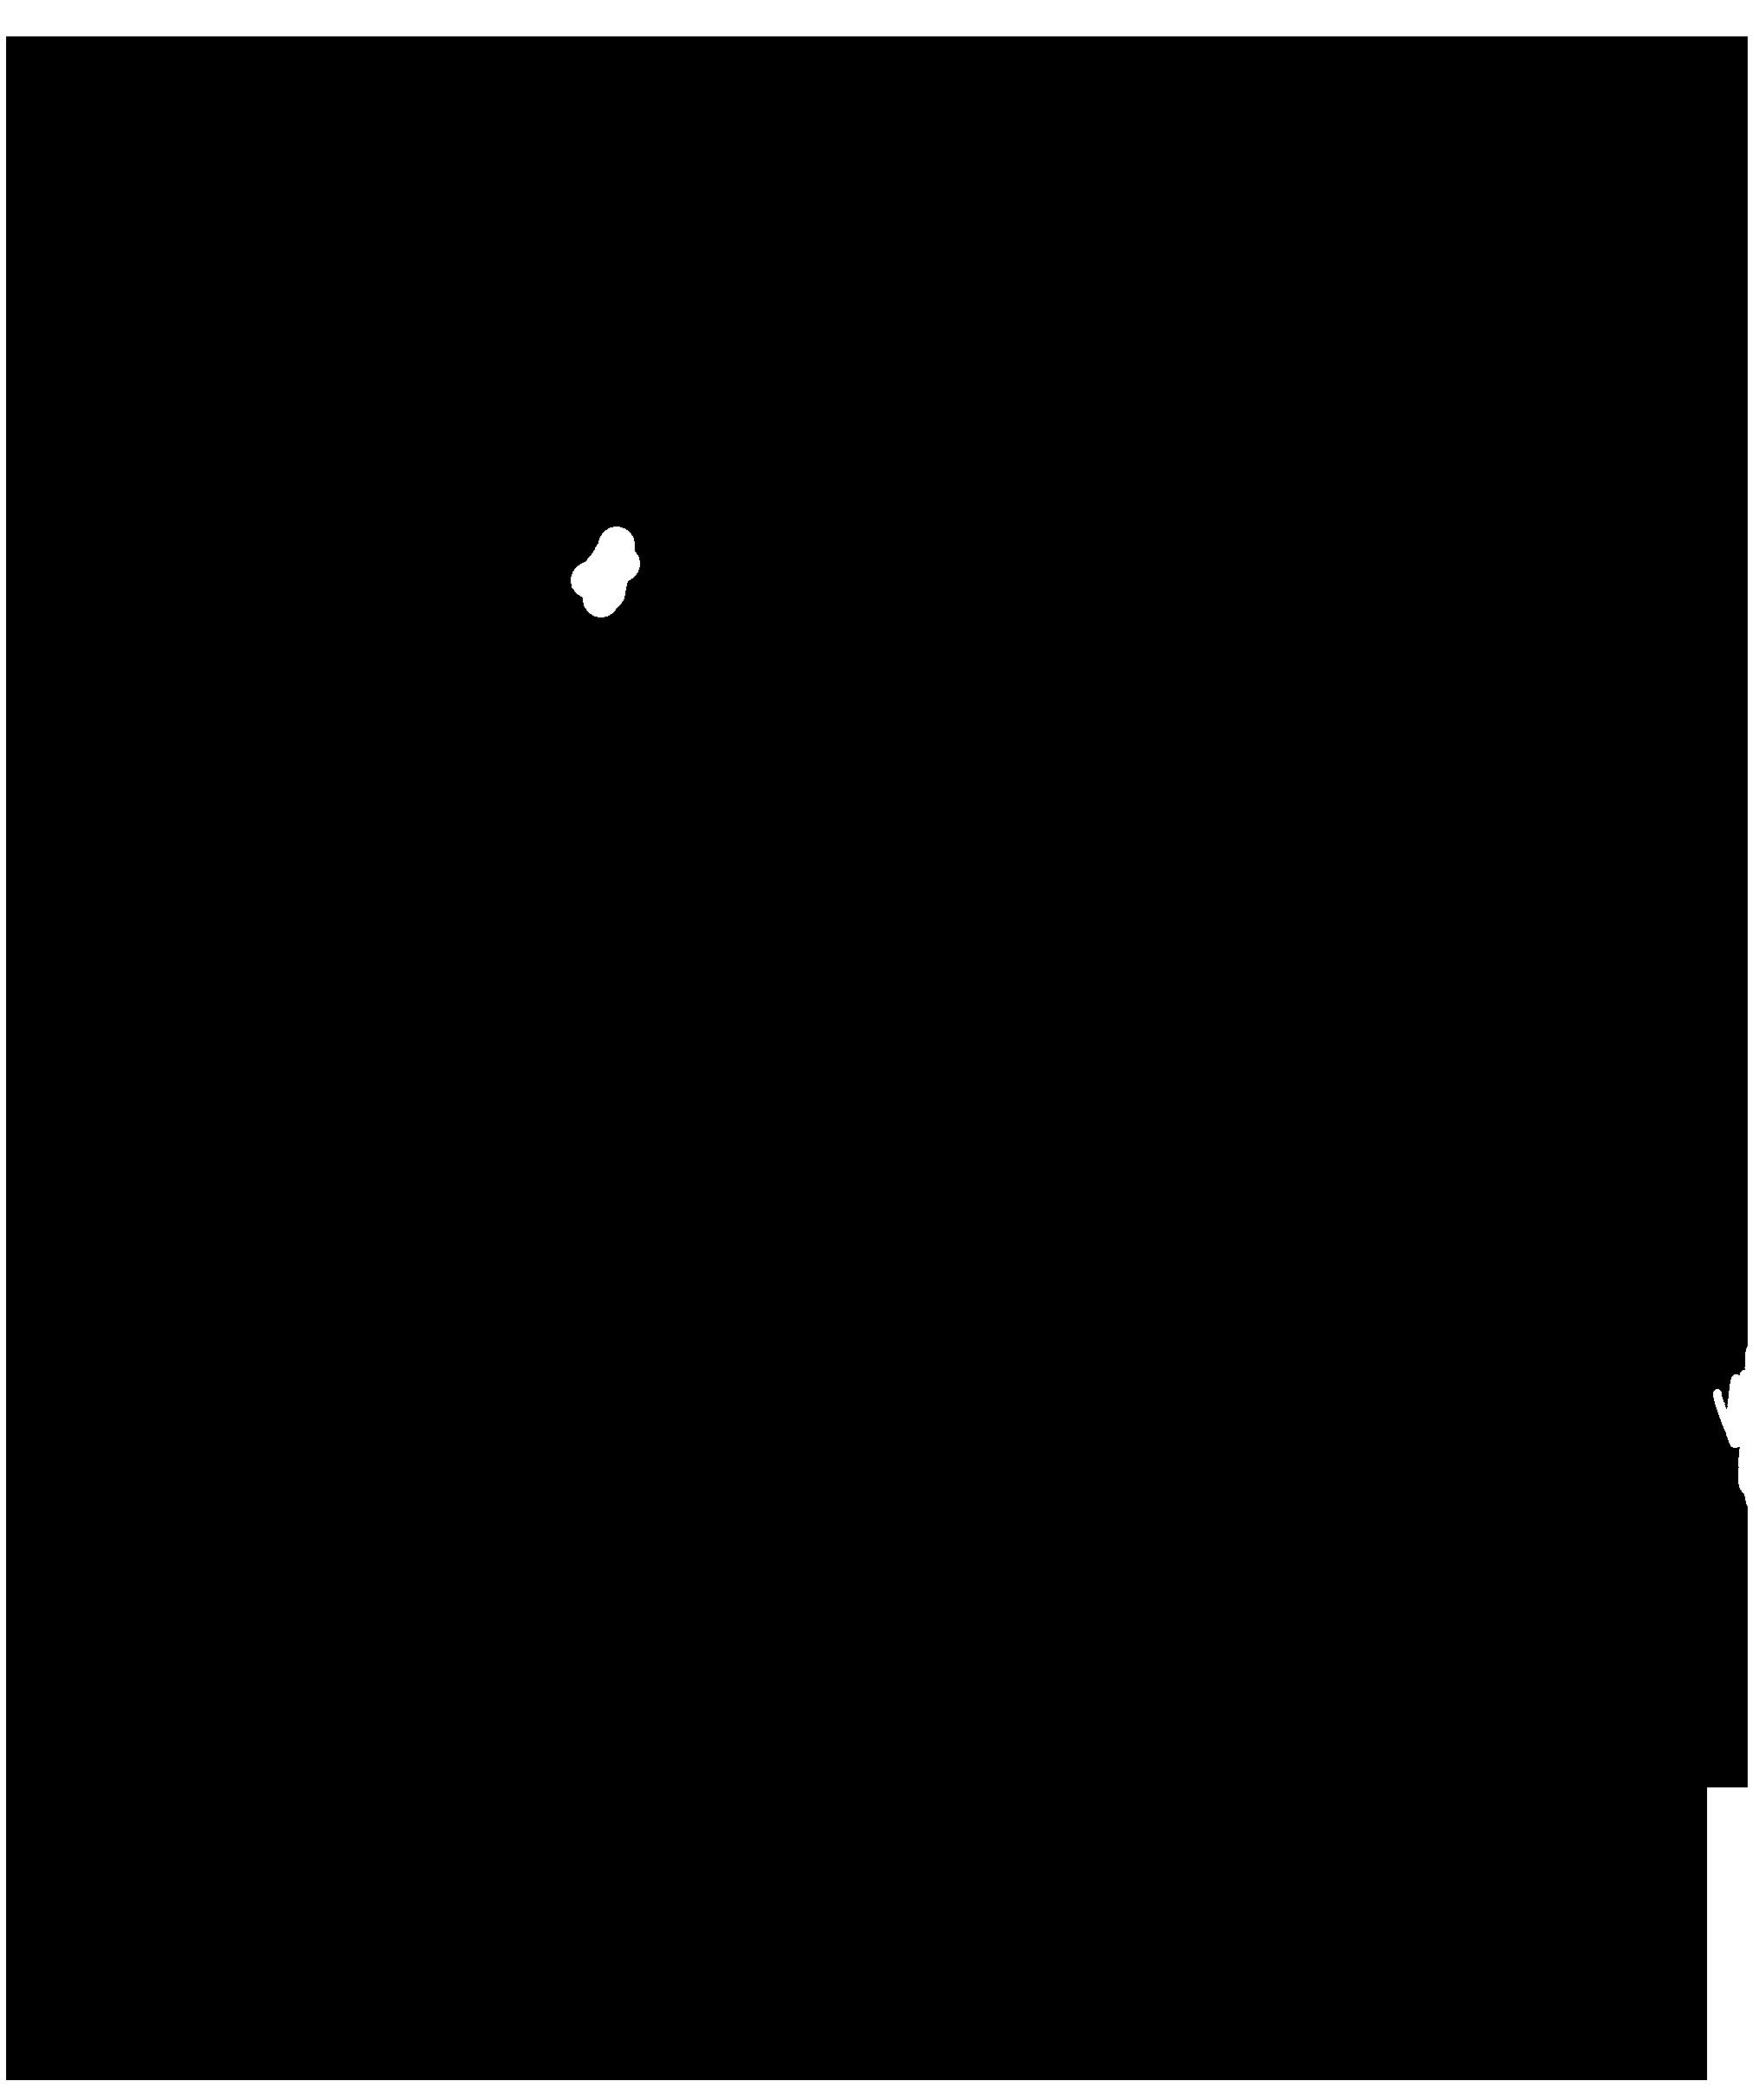 DerajLetterPatreon-short2.png